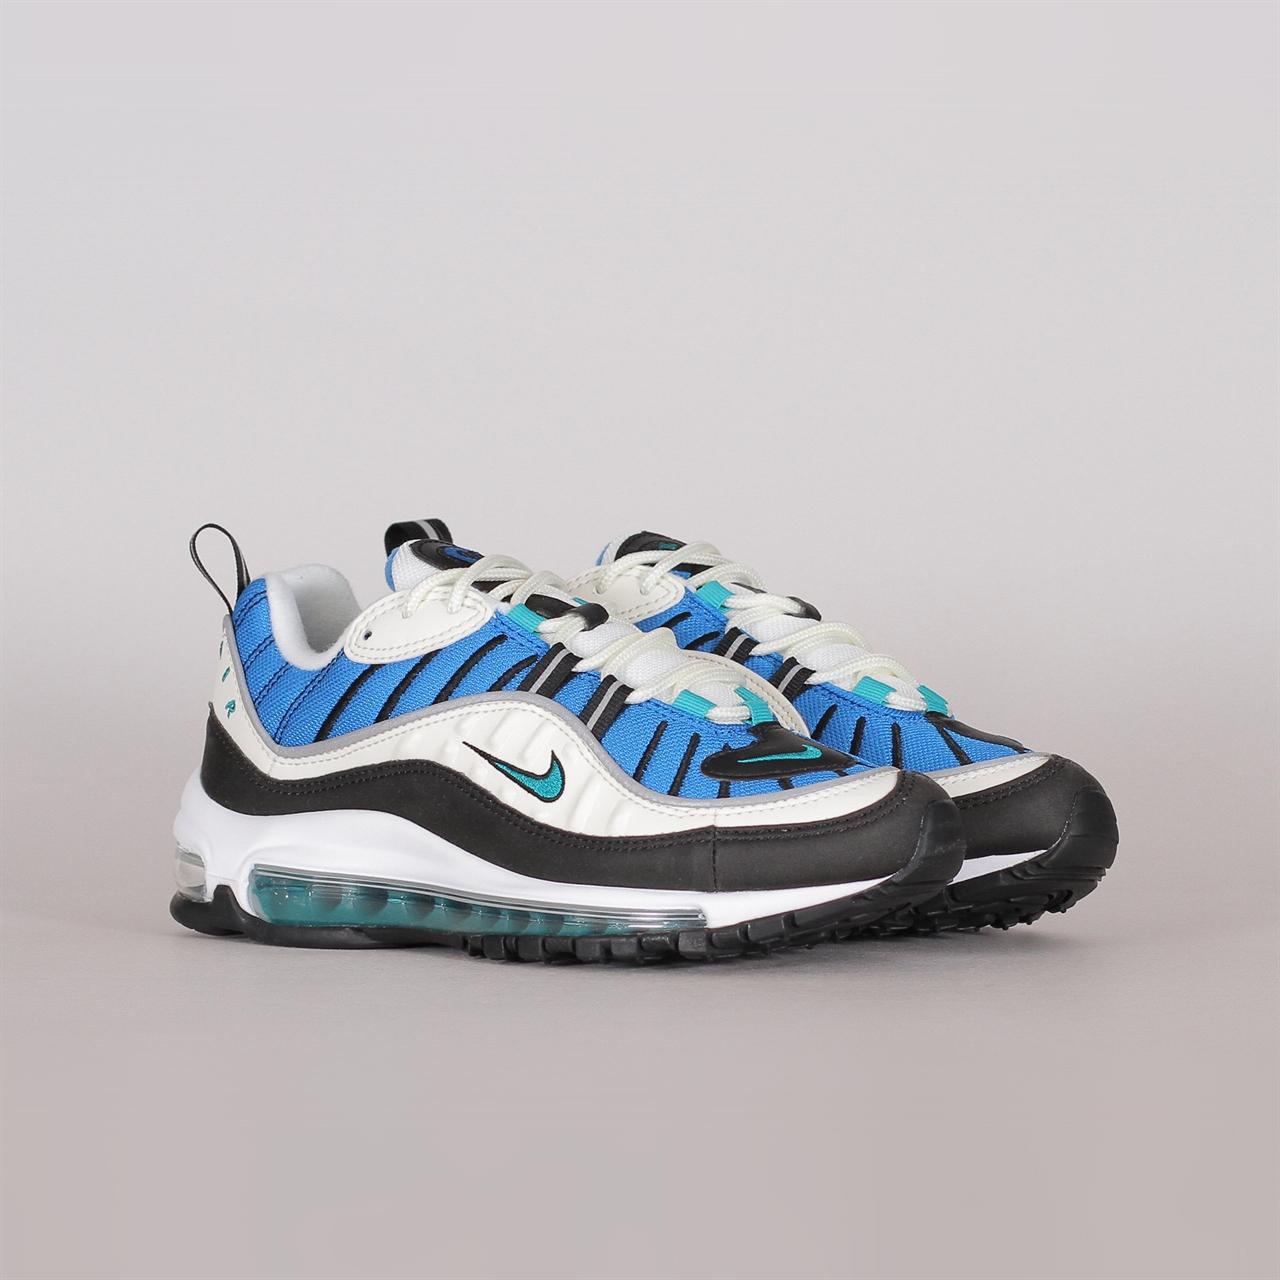 bc32f56fce Nike Sportswear Womens Air Max 98 (AH6799-106) - Shelta